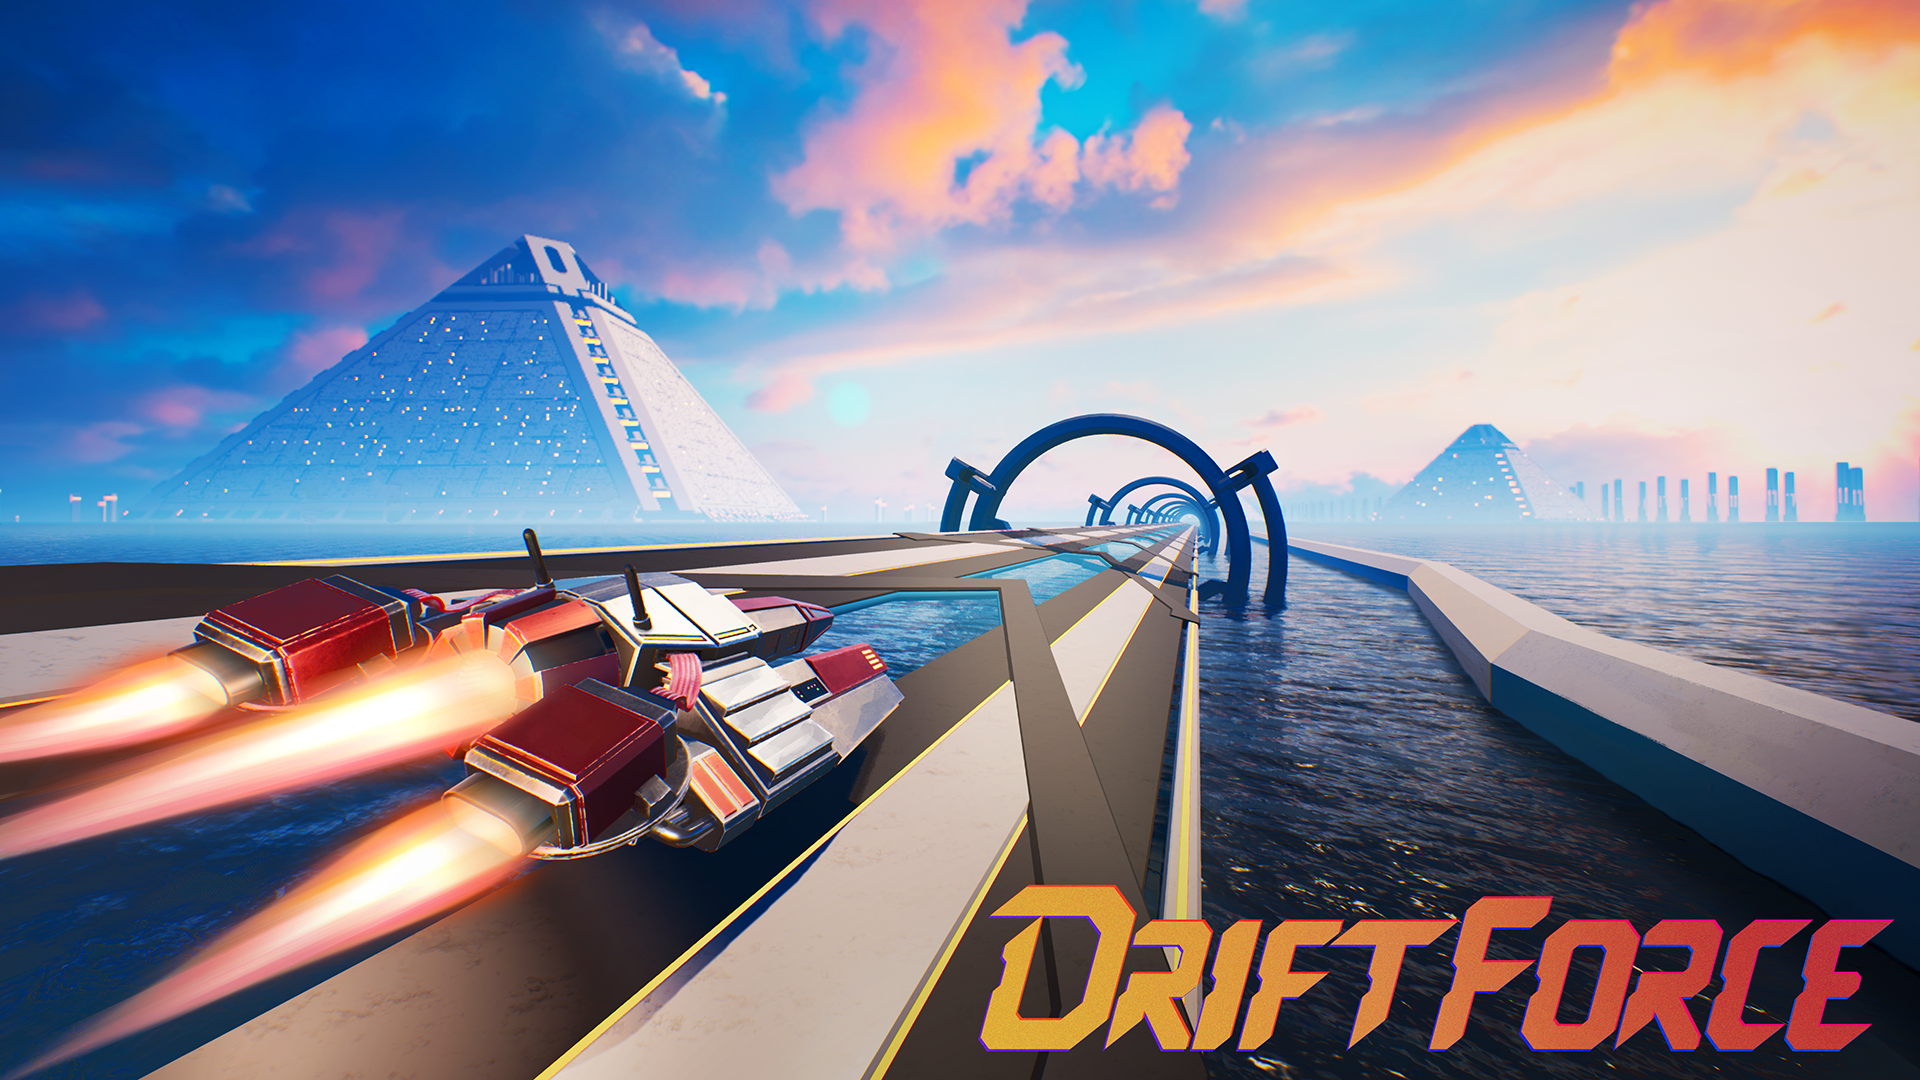 DriftForce_KeyArt.png